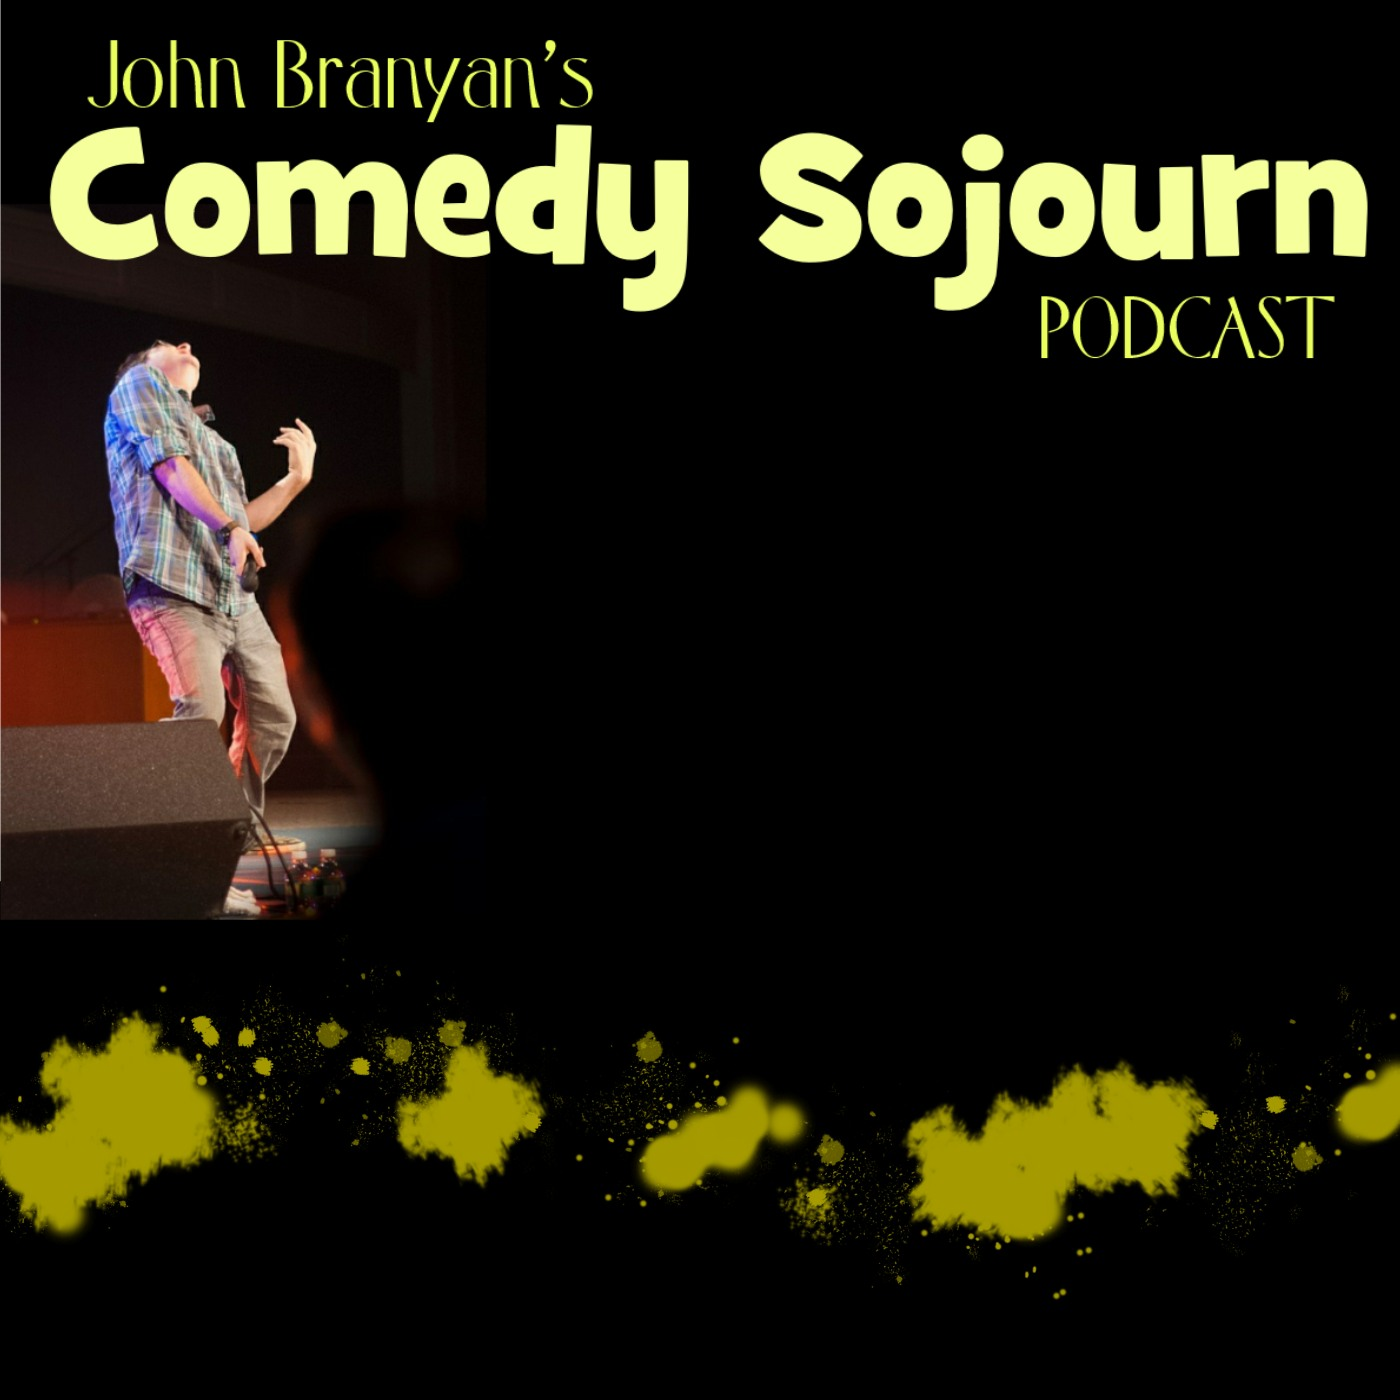 John Branyan's Comedy Sojourn Podcast show art